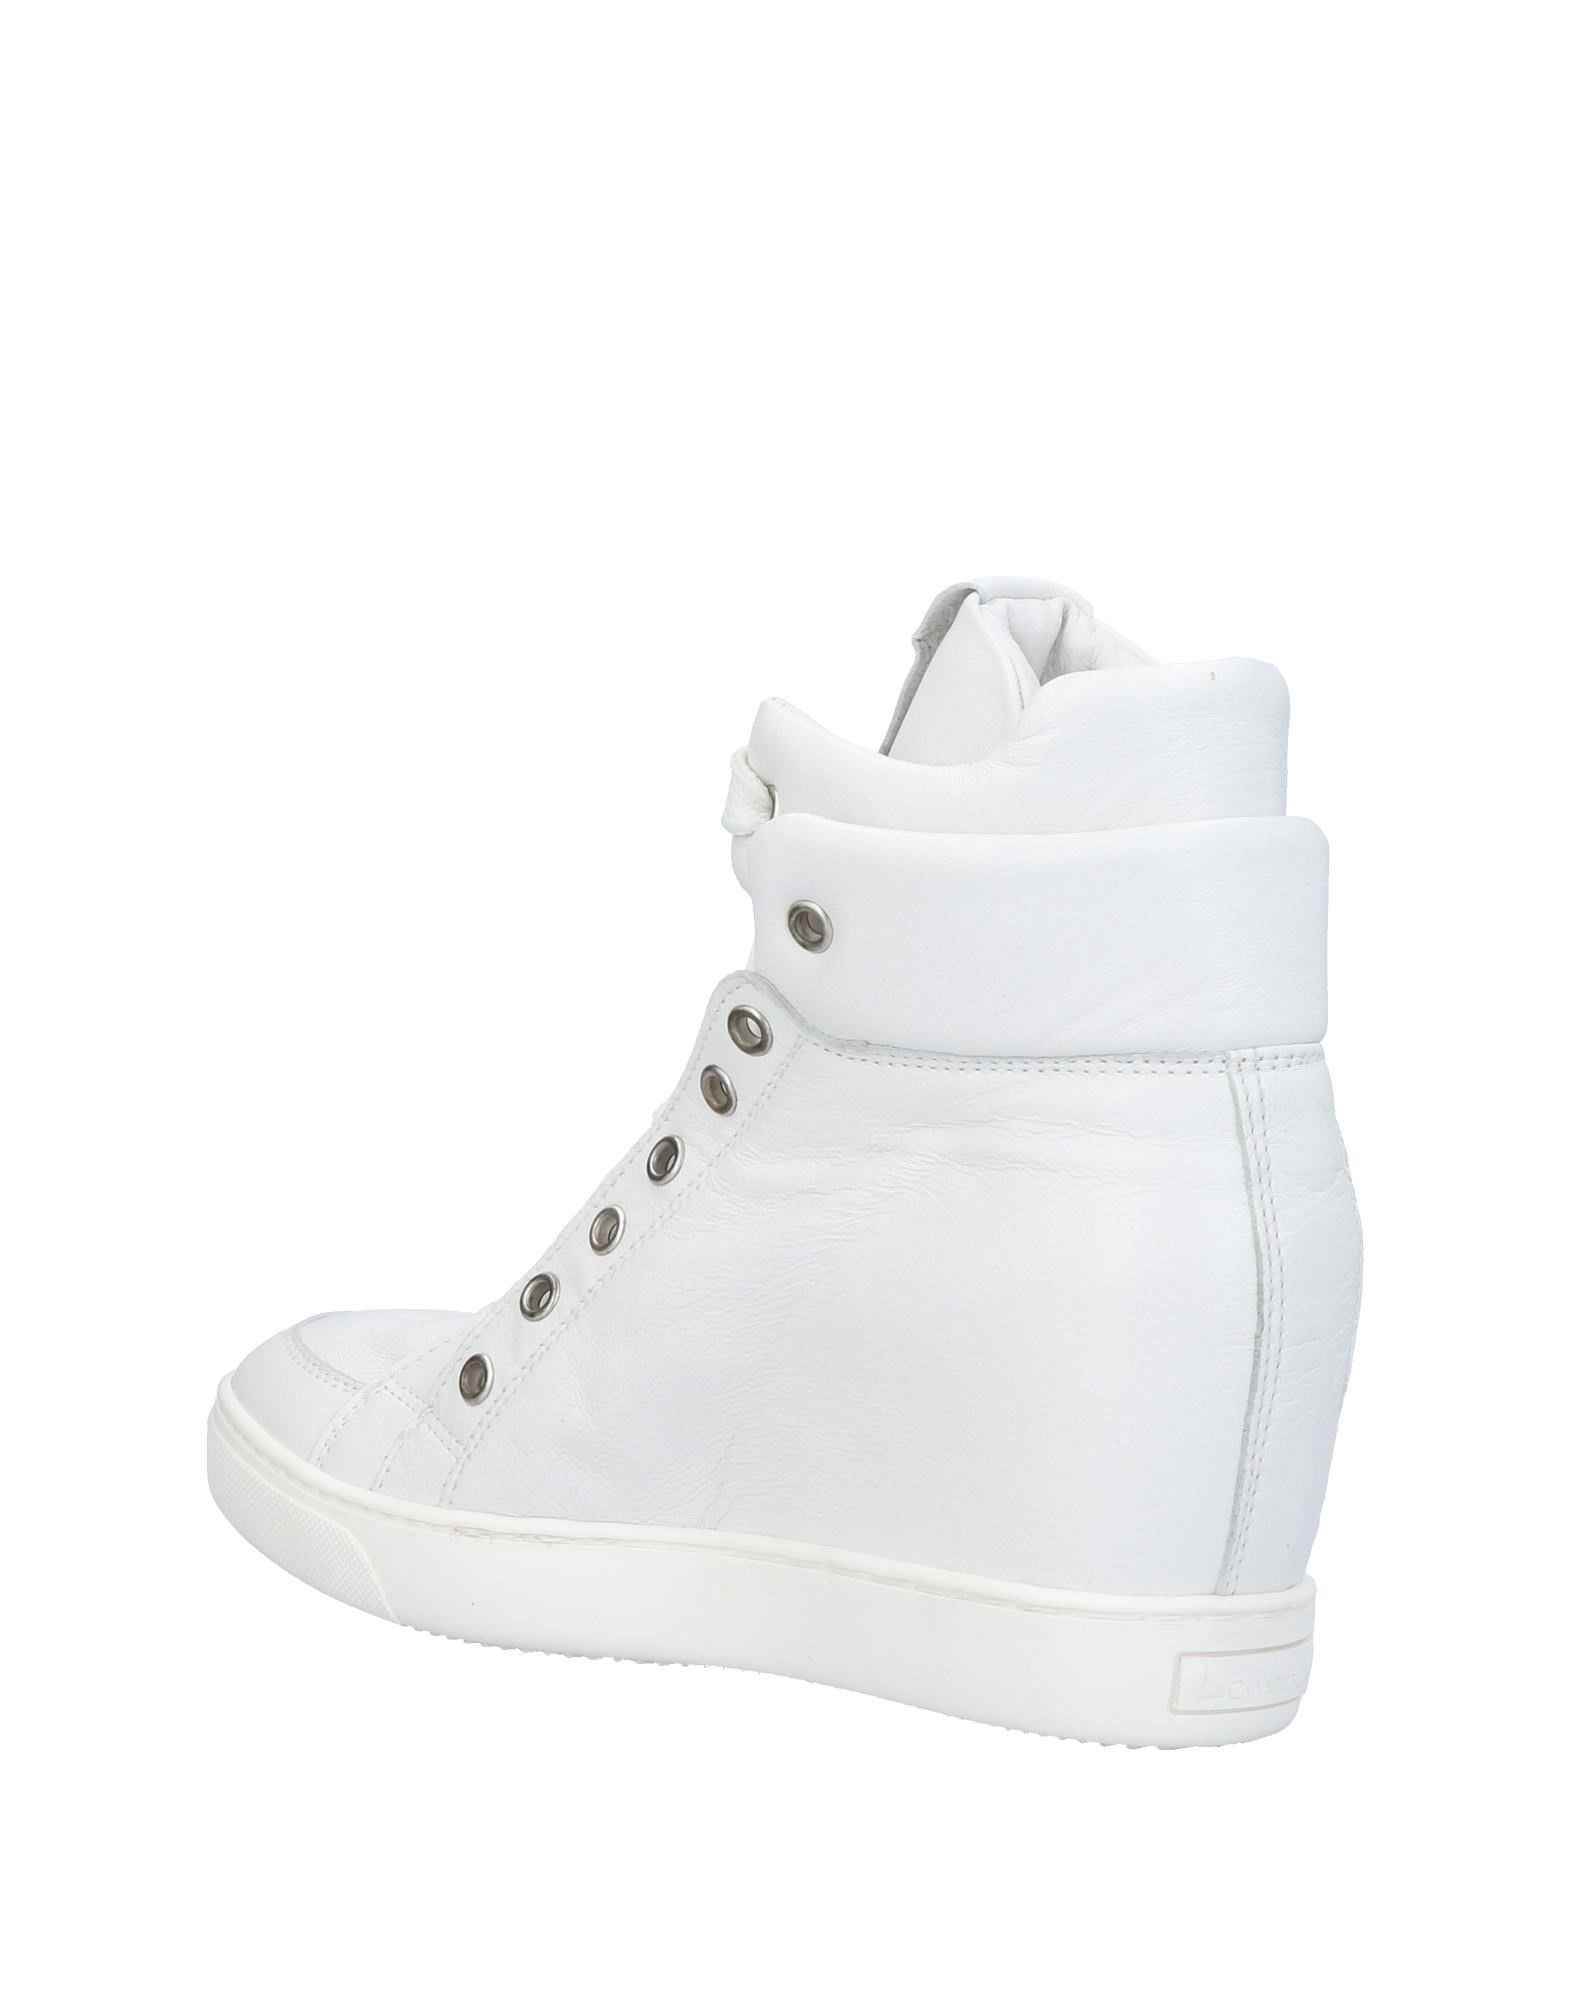 Gut um Sneakers billige Schuhe zu tragenLemaré Sneakers um Damen  11429528HK 77b6e6